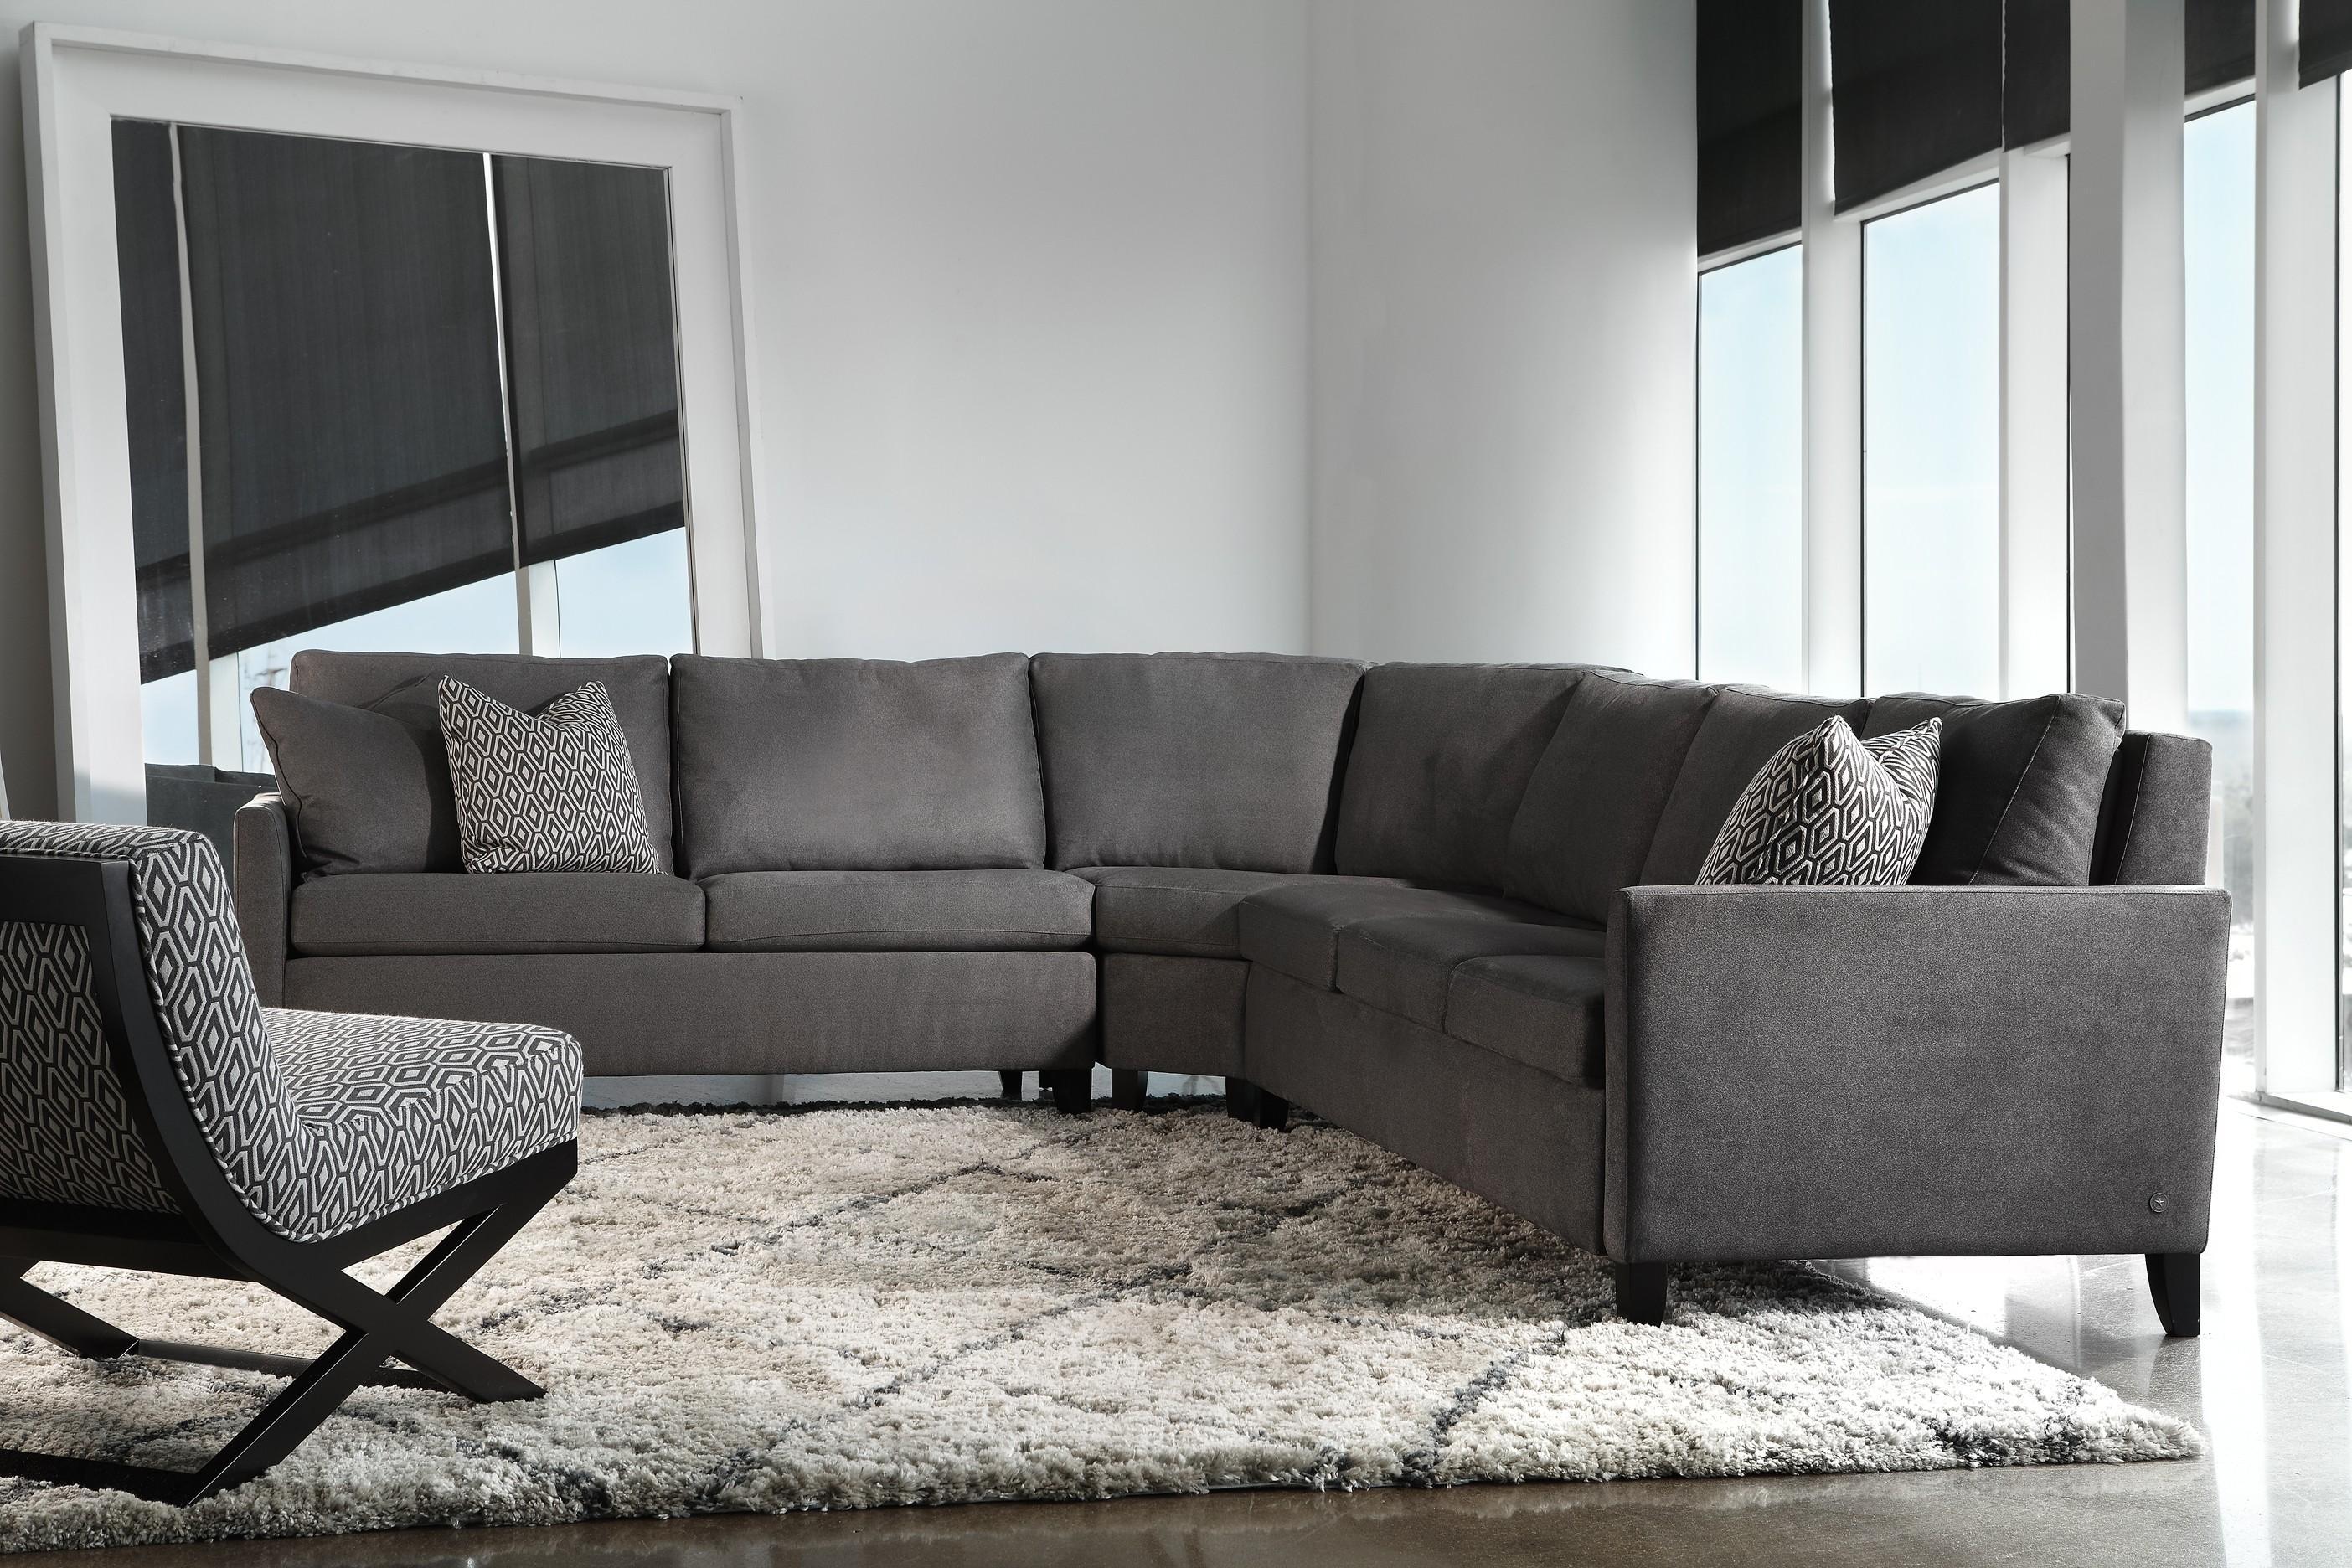 Sofa Ideas: Sleek Sectional Sofa (Explore #19 Of 20 Photos) with regard to Sleek Sectional Sofas (Image 10 of 10)